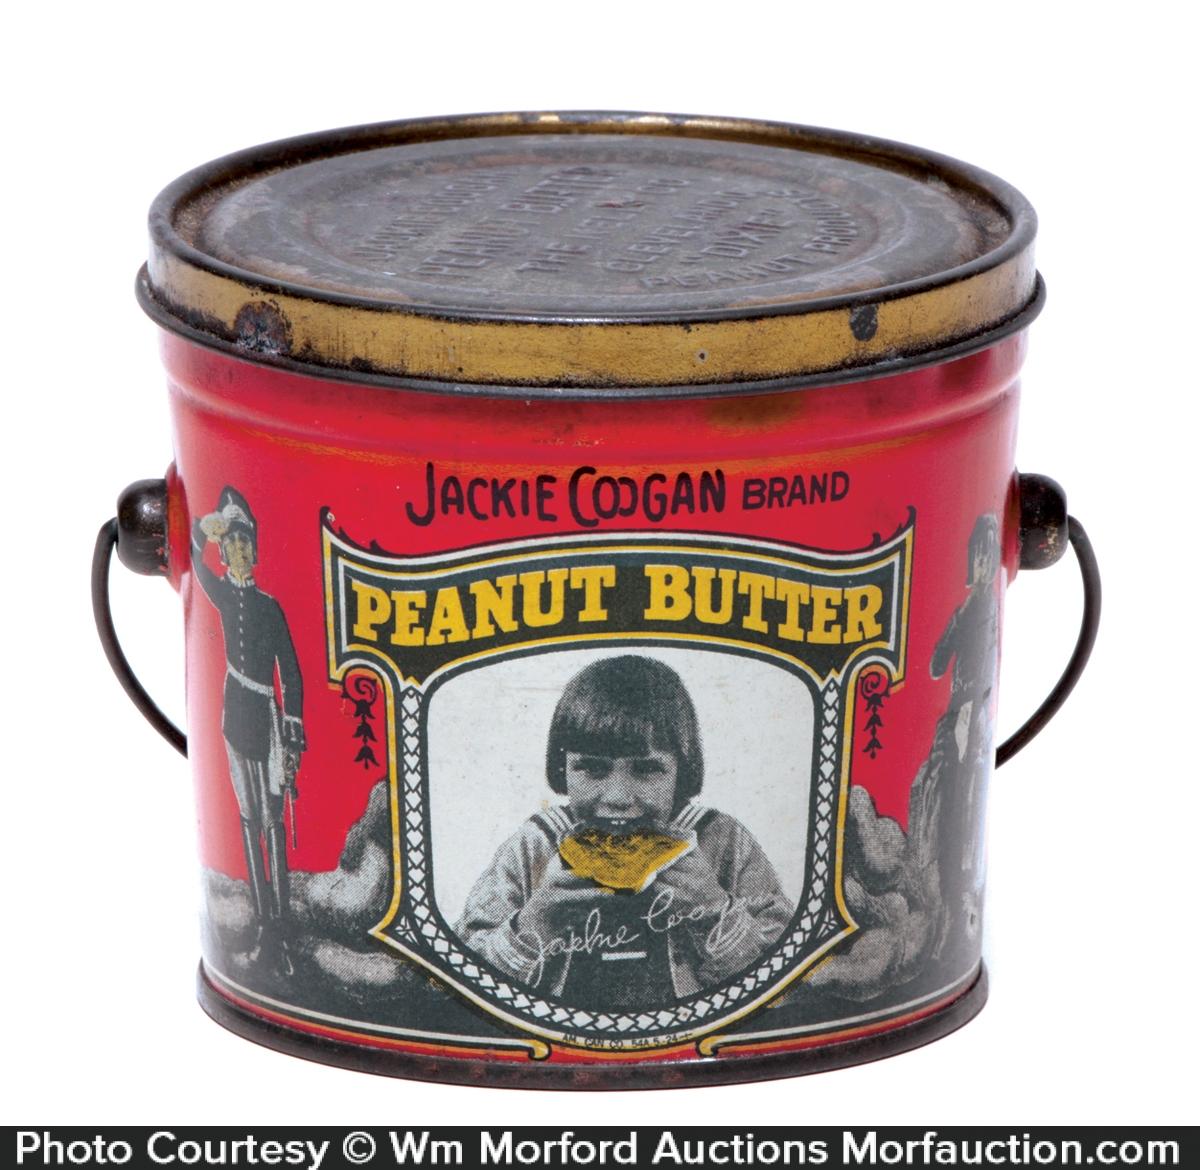 Jackie Coogan Peanut Butter